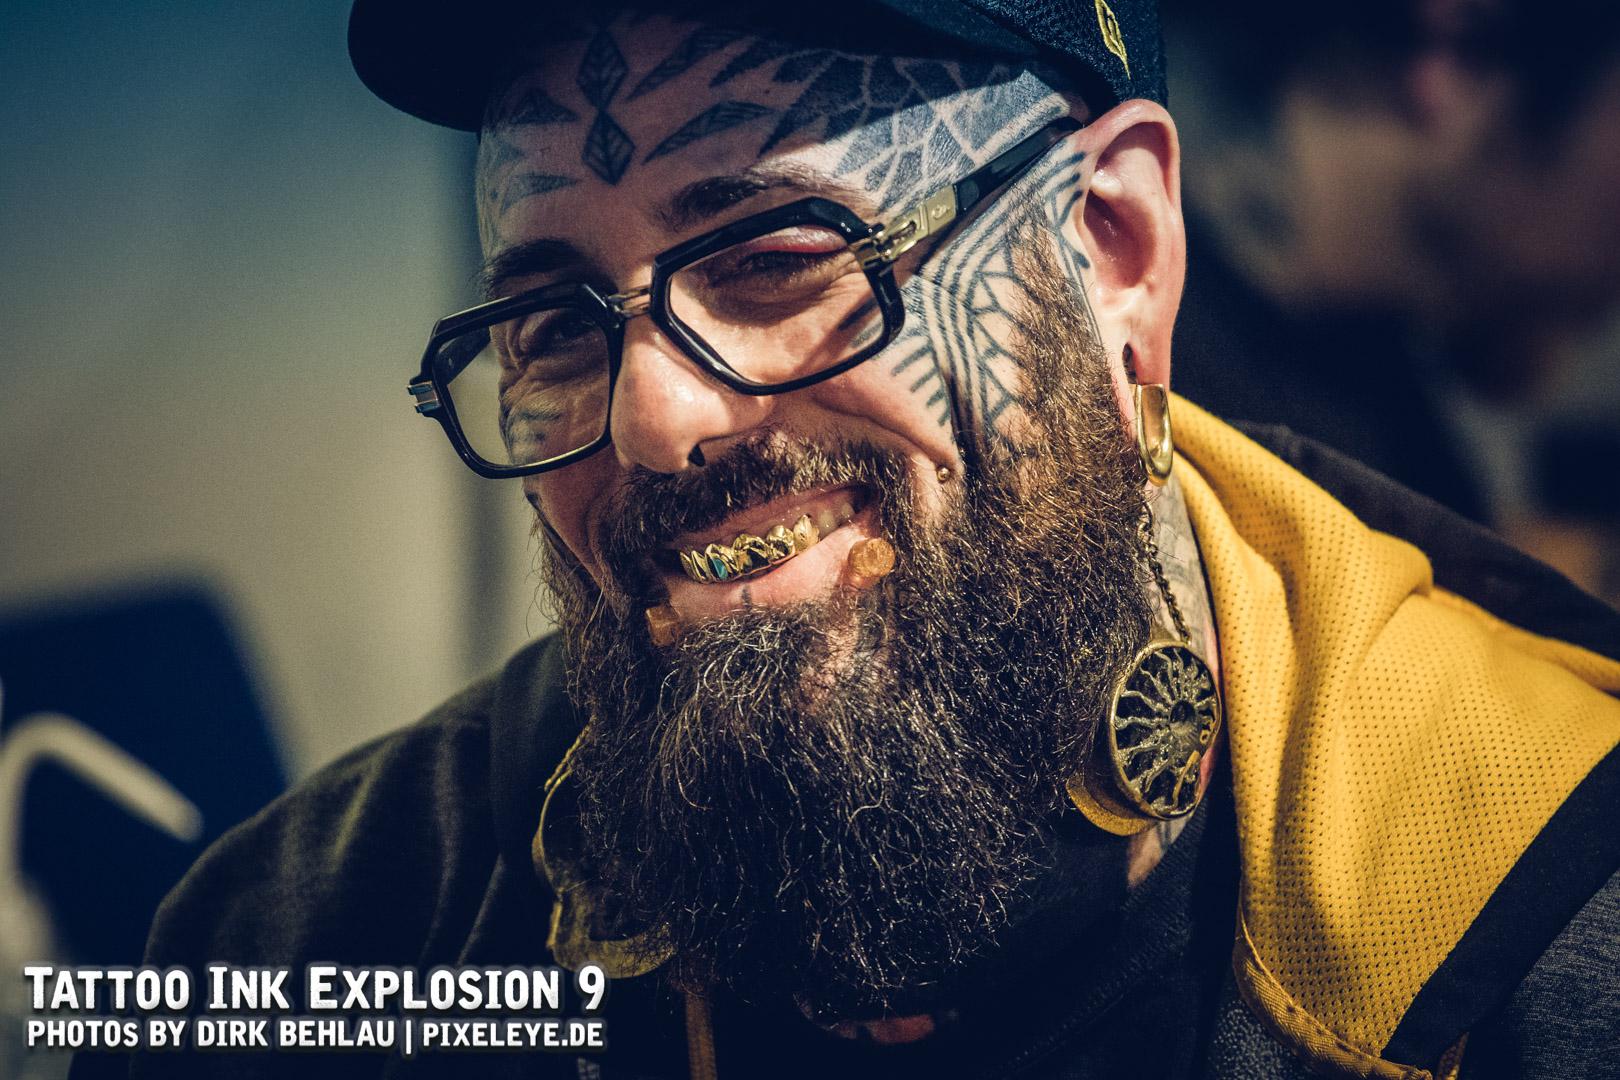 Tattoo Ink Explosion 2018 WEB by Dirk Behlau-1317.jpg